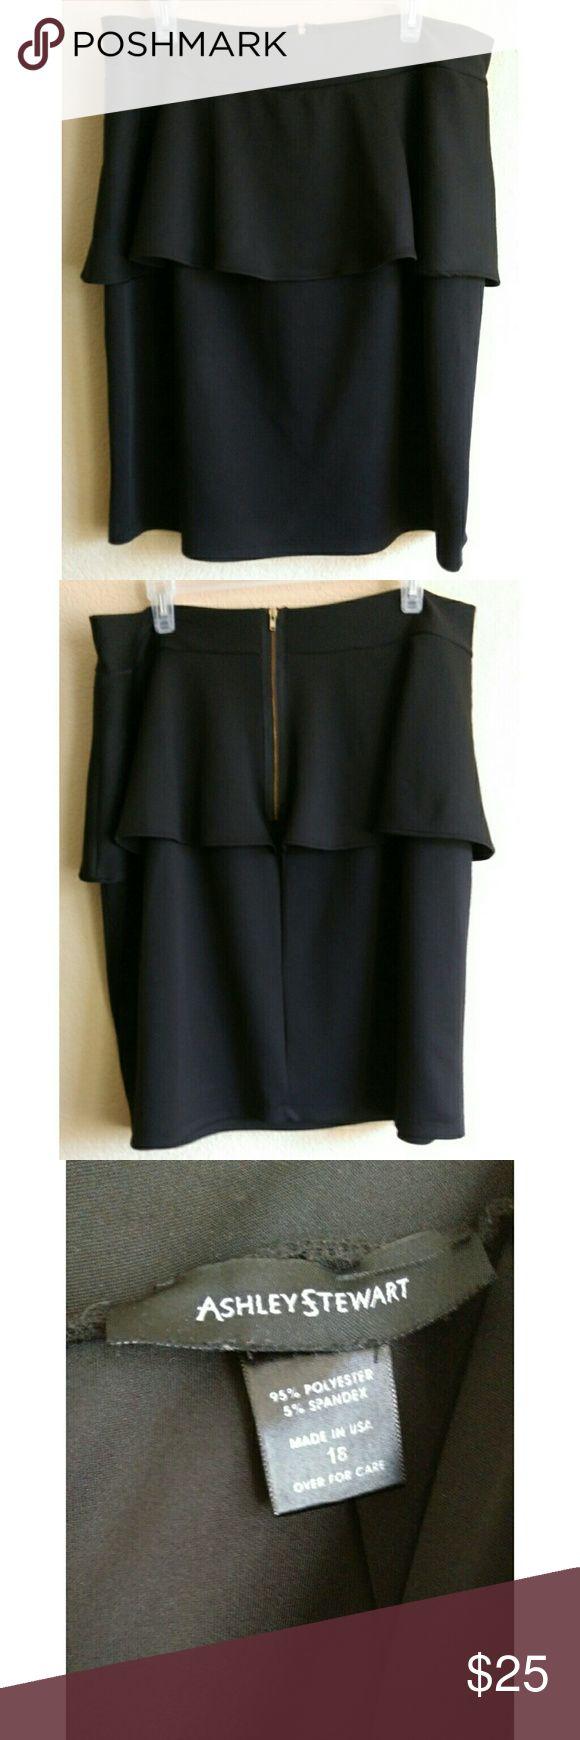 Ashley Stewart Peplum Skirt Size 18 Black stretch peplum pencil skirt in excellent pre loved condition Ashley Stewart Skirts Pencil